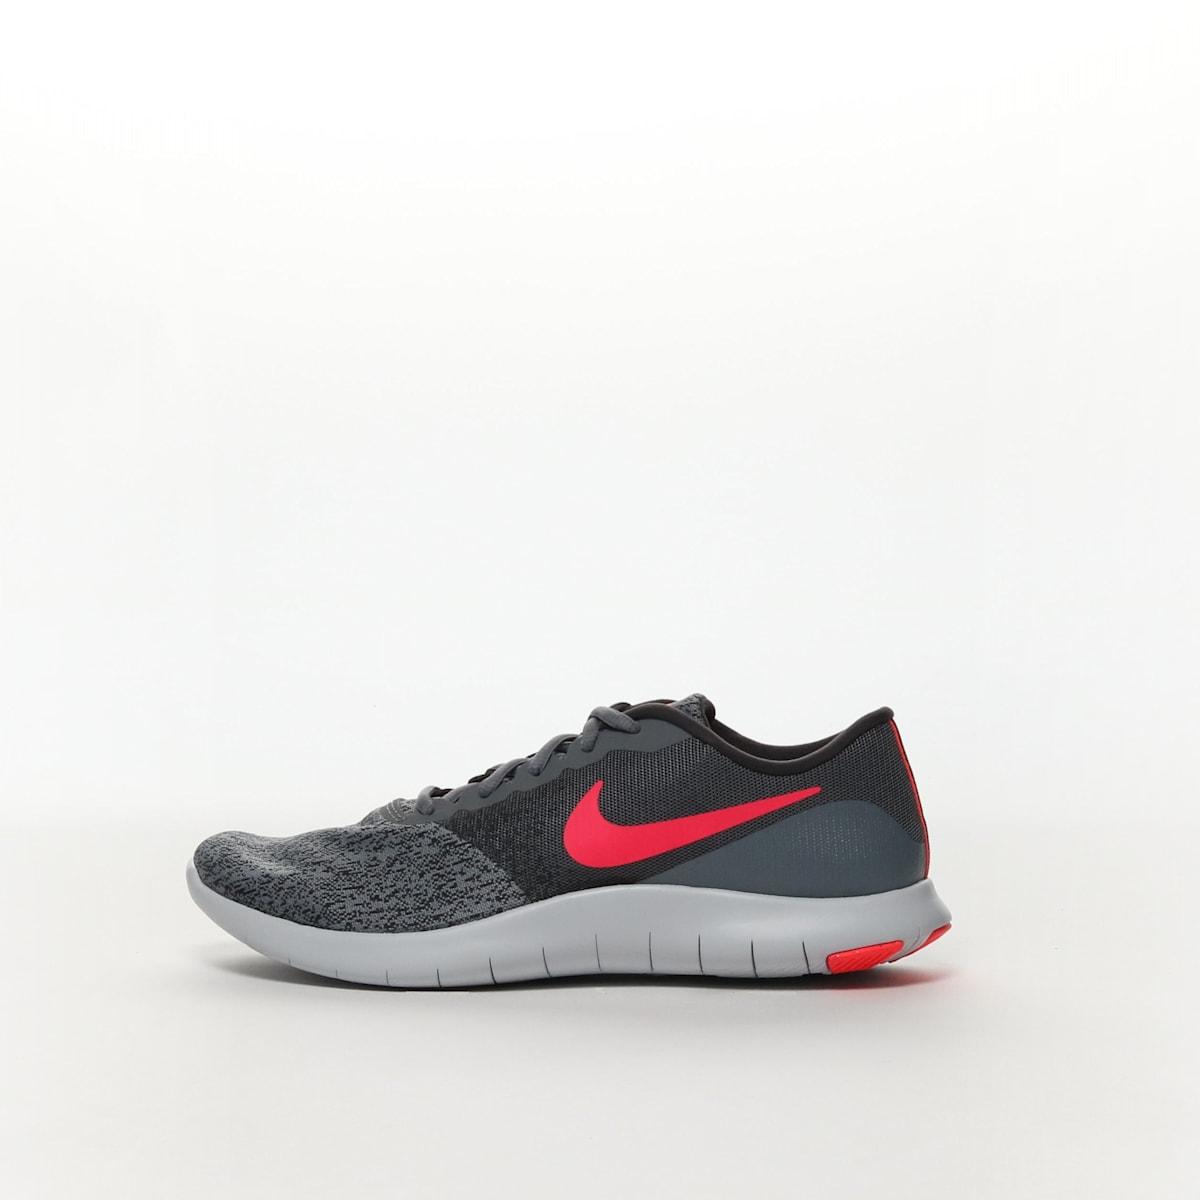 f66db943721 Women s Nike Flex Contact Running Shoe - COOL GREY SOLAR RED ...